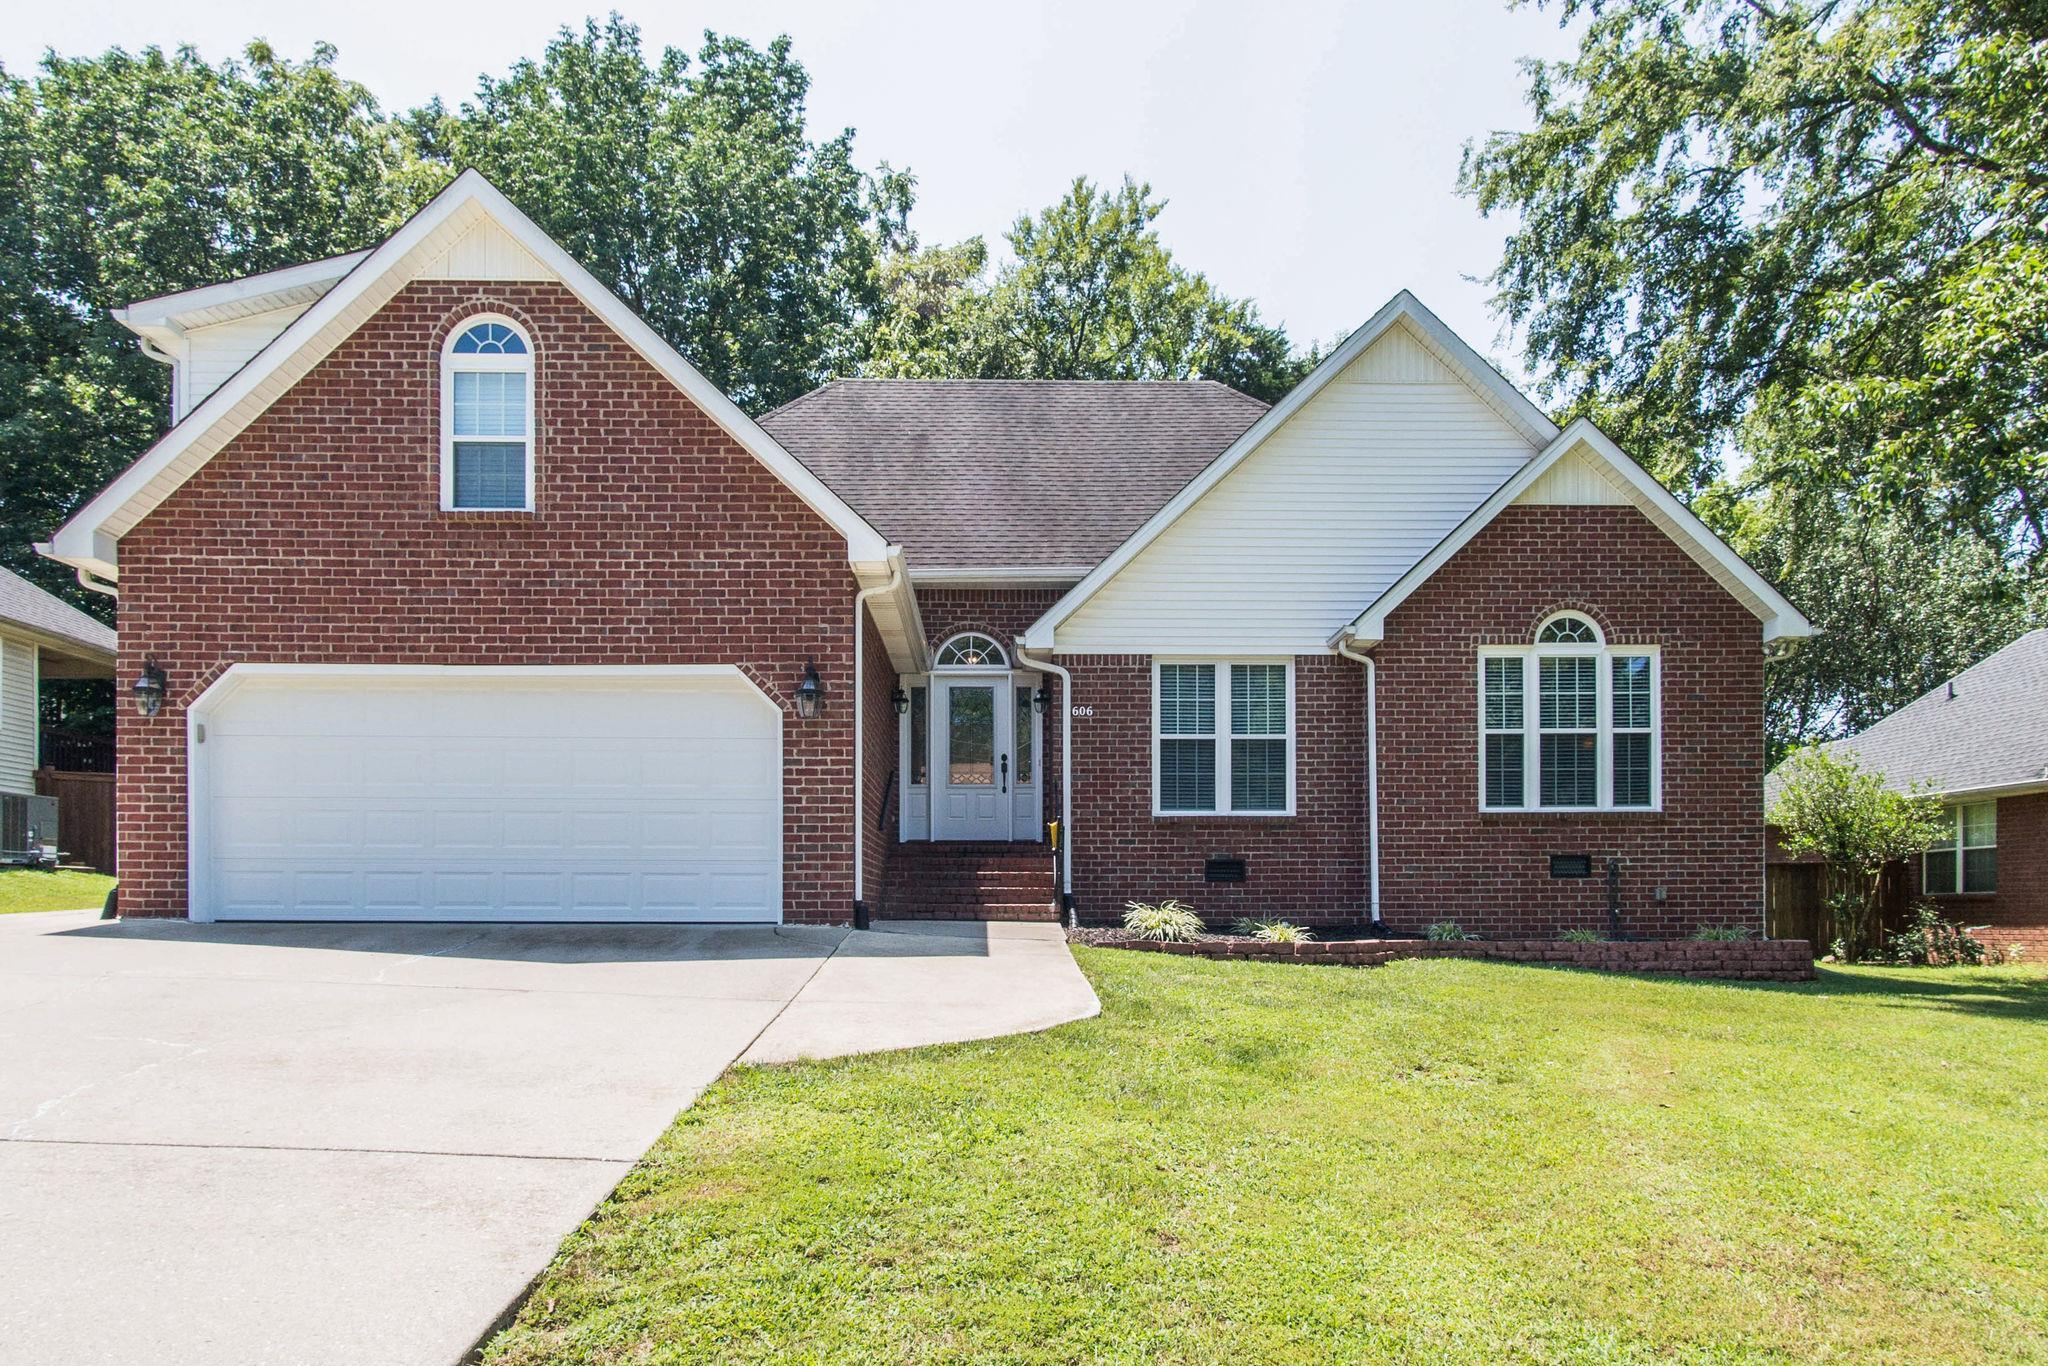 606 Woodland Hills Dr, LA VERGNE, TN 37086 - LA VERGNE, TN real estate listing